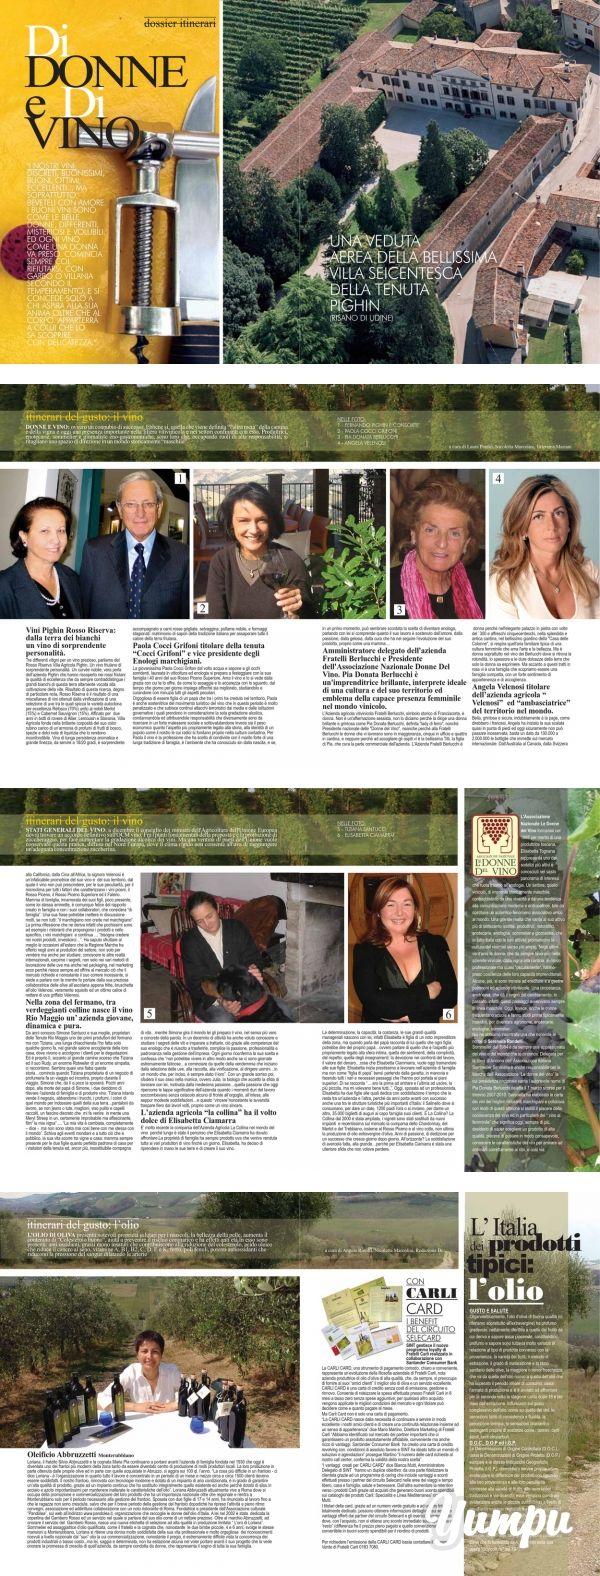 http://www.donnaimpresa.com Donna Impresa Magazine - Magazine with 9 pages: Donna Impresa Magazine